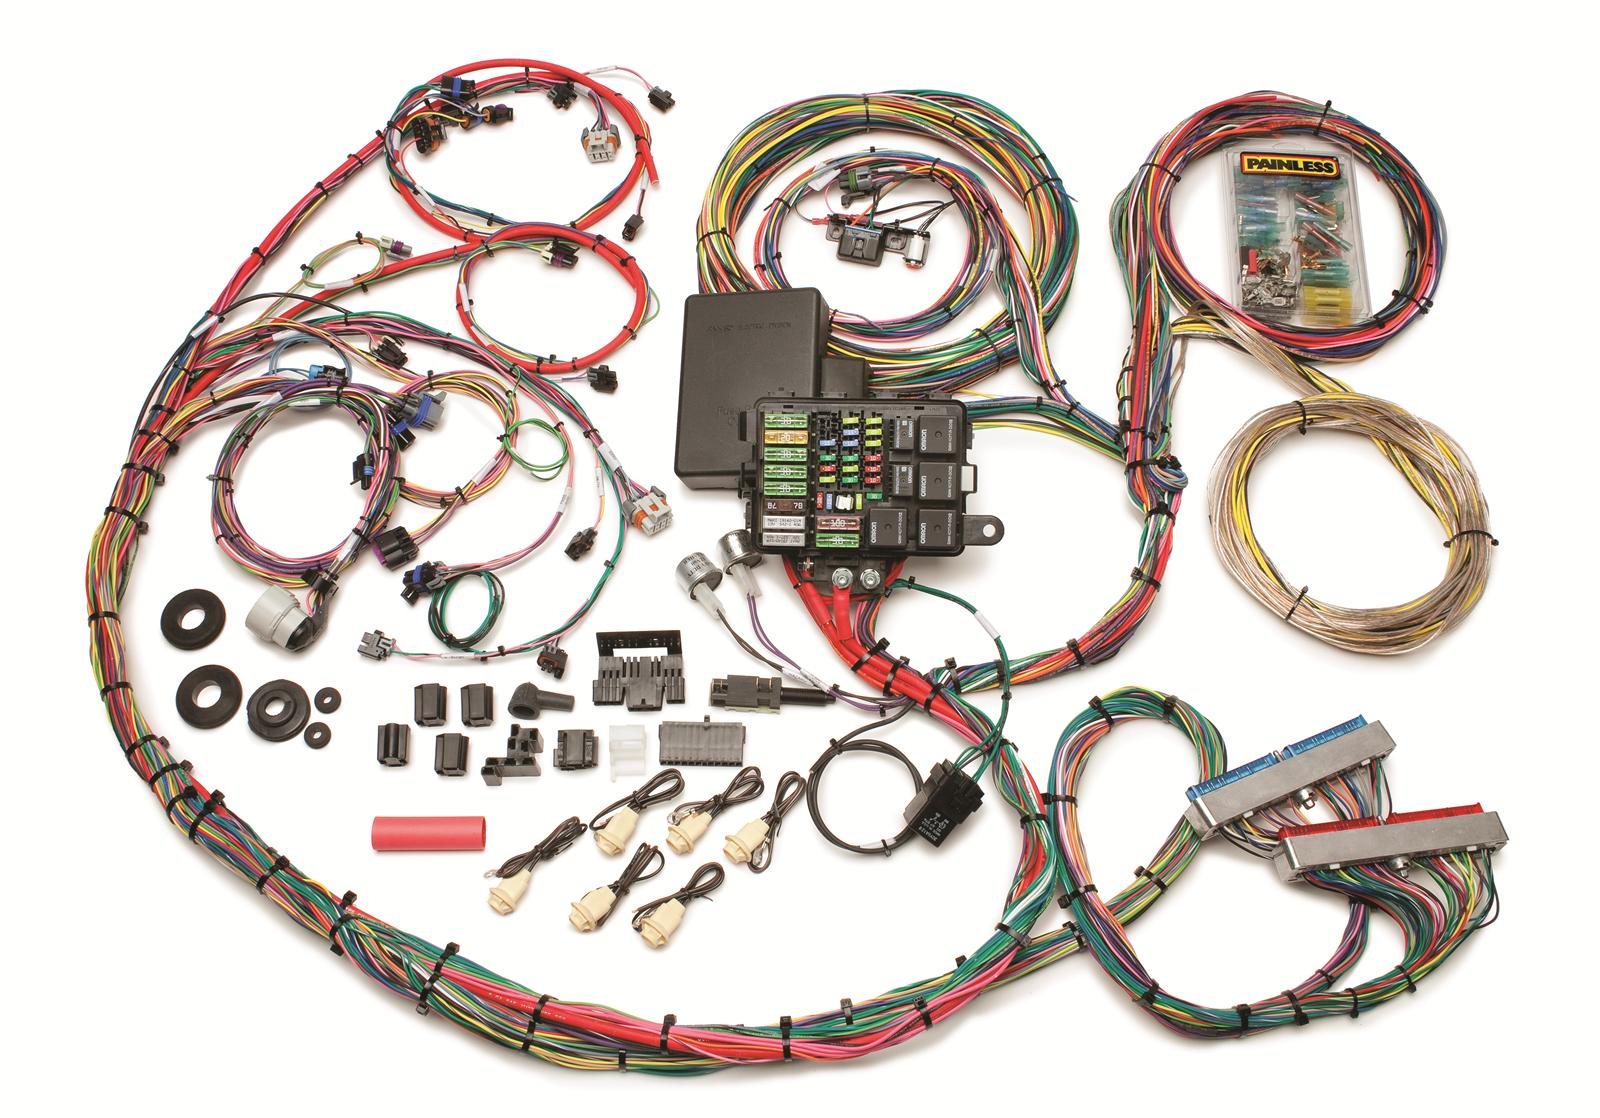 sbc wiring harness wiring diagram